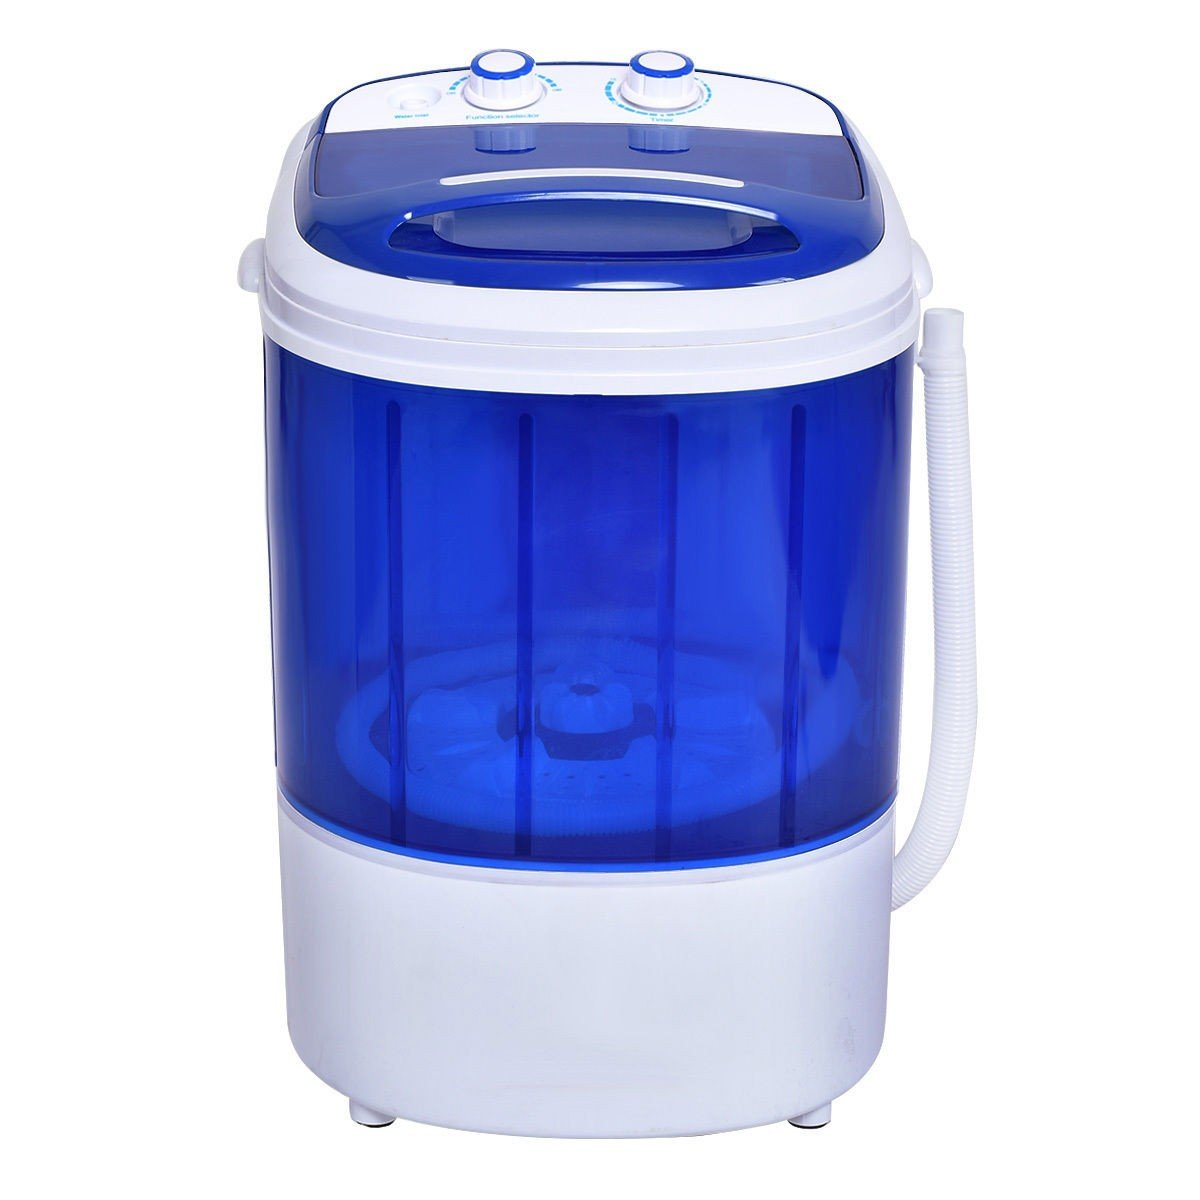 Mini Portable Small Washing Machine Laundry Clothes Washer Spin Dryer Unit Set Apontus